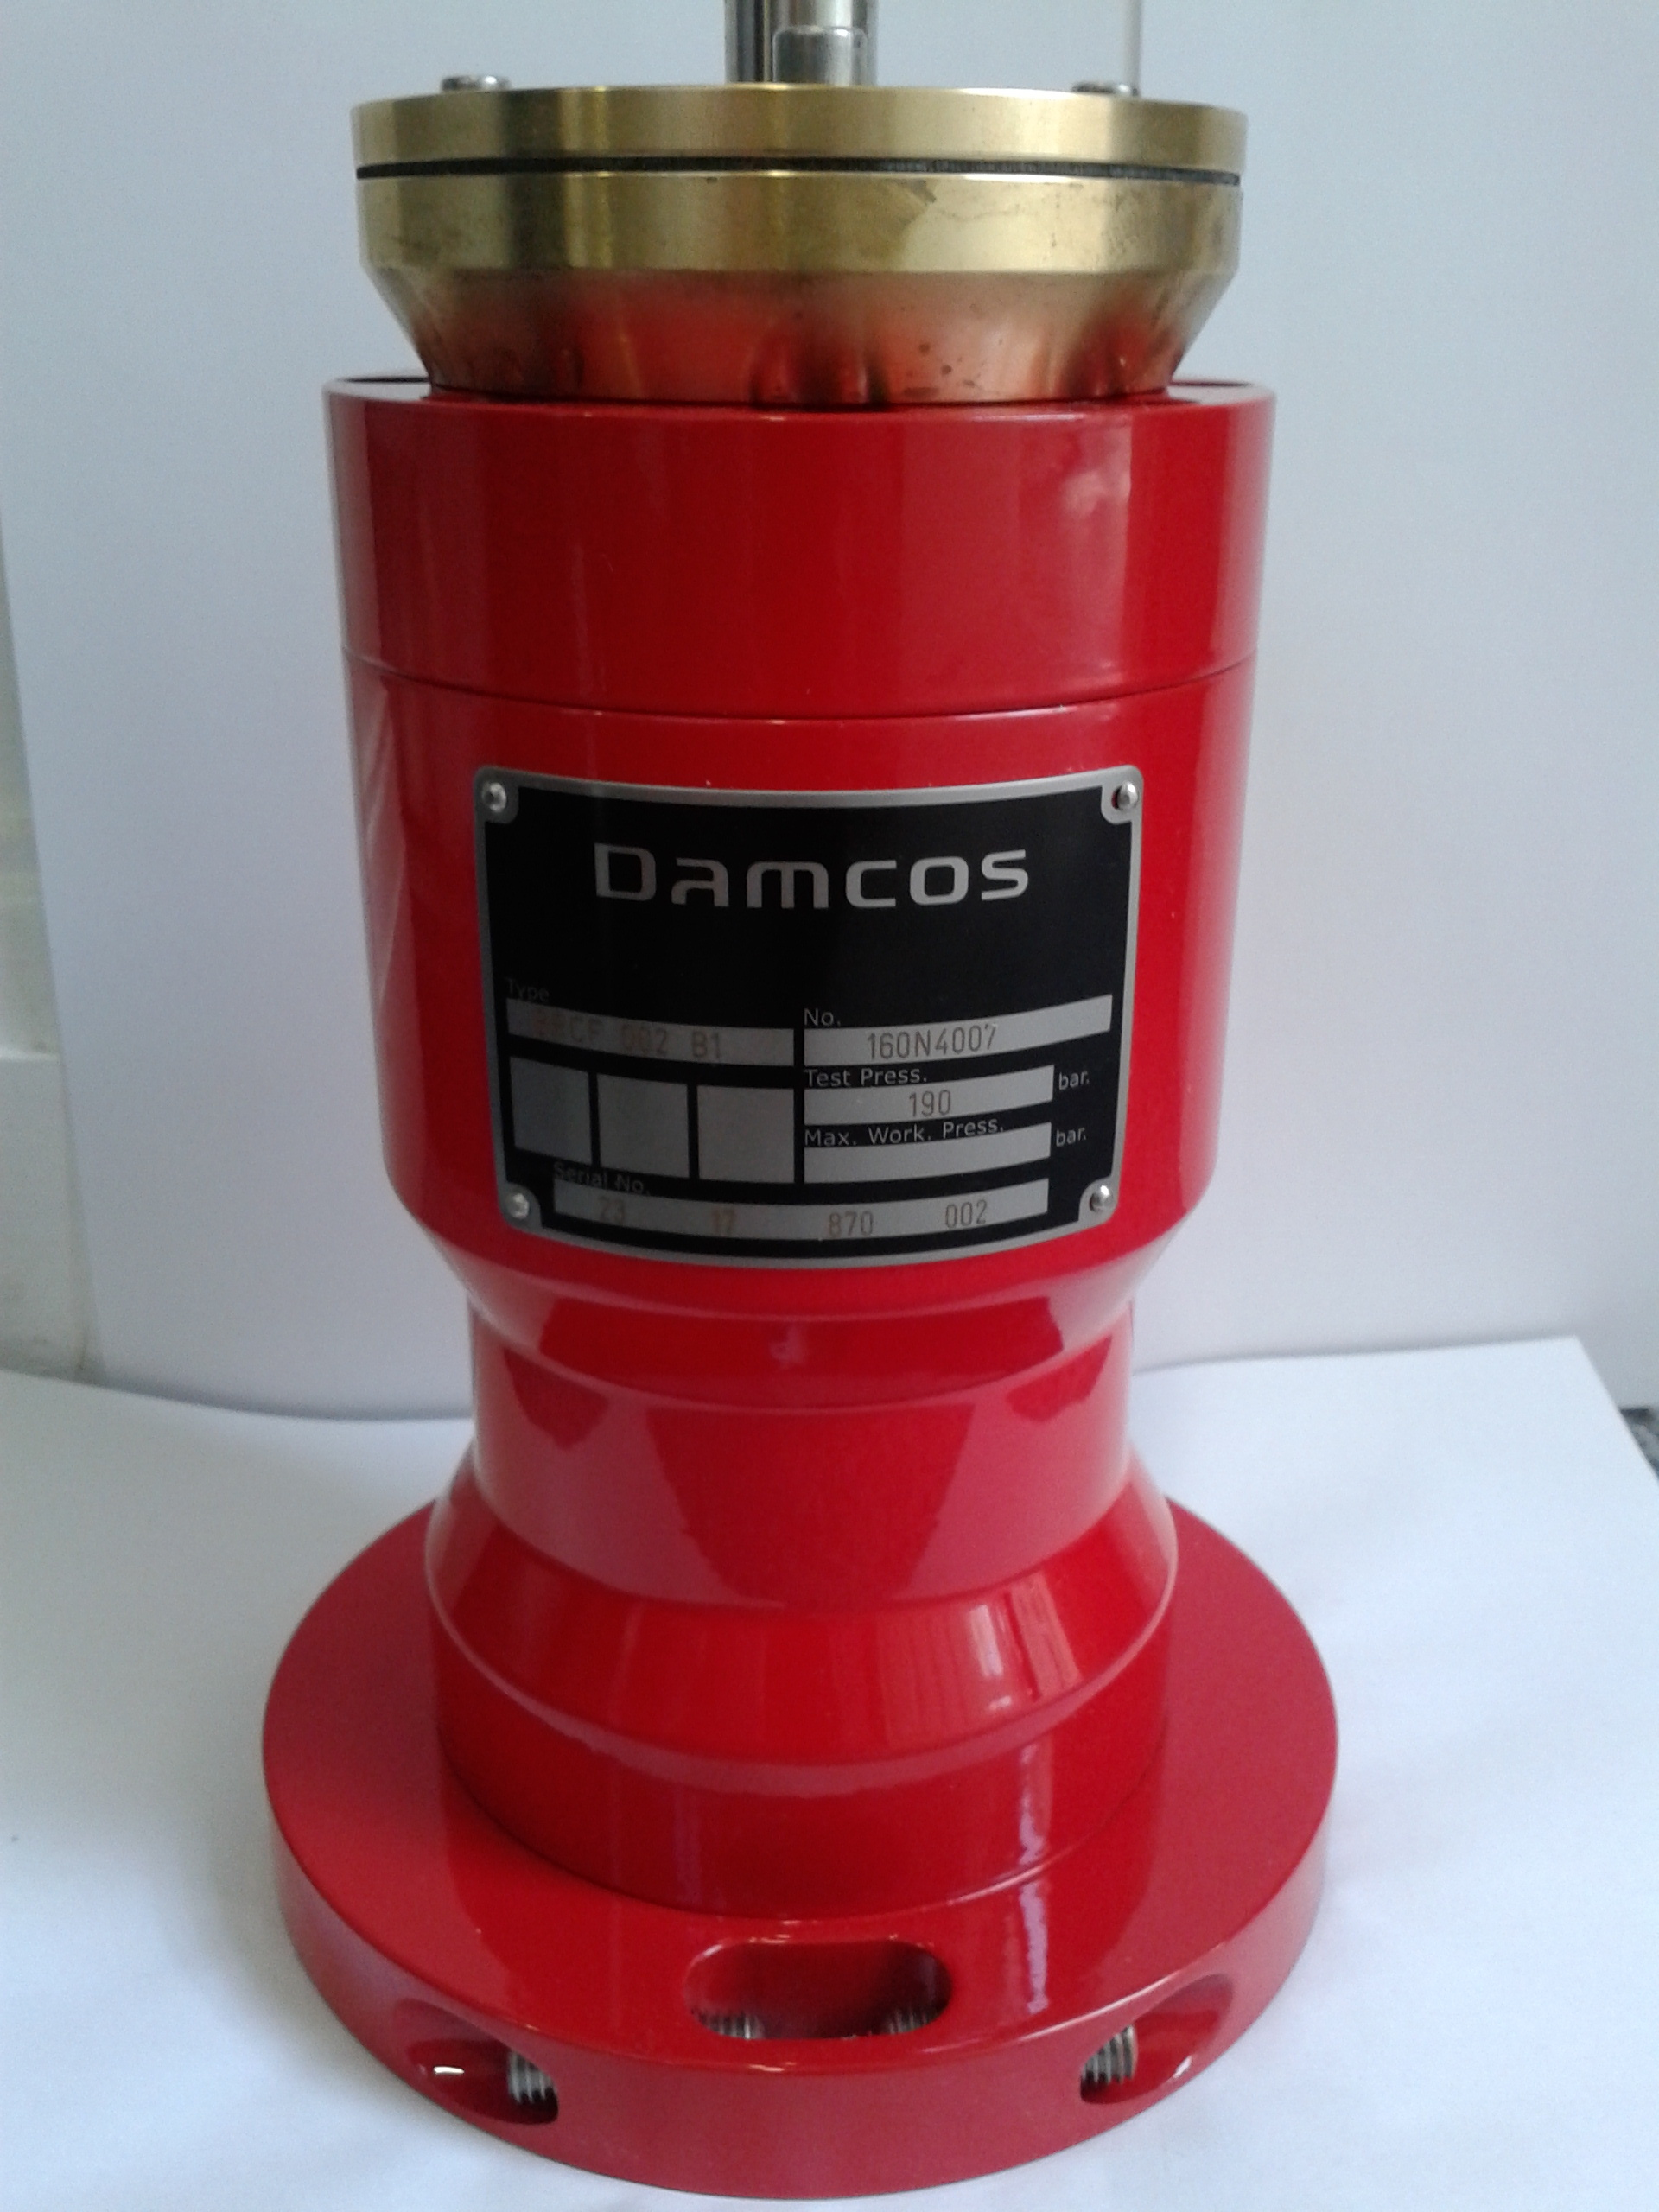 Damcos Danfoss BRCF-002-B1 Actuator 160N4007